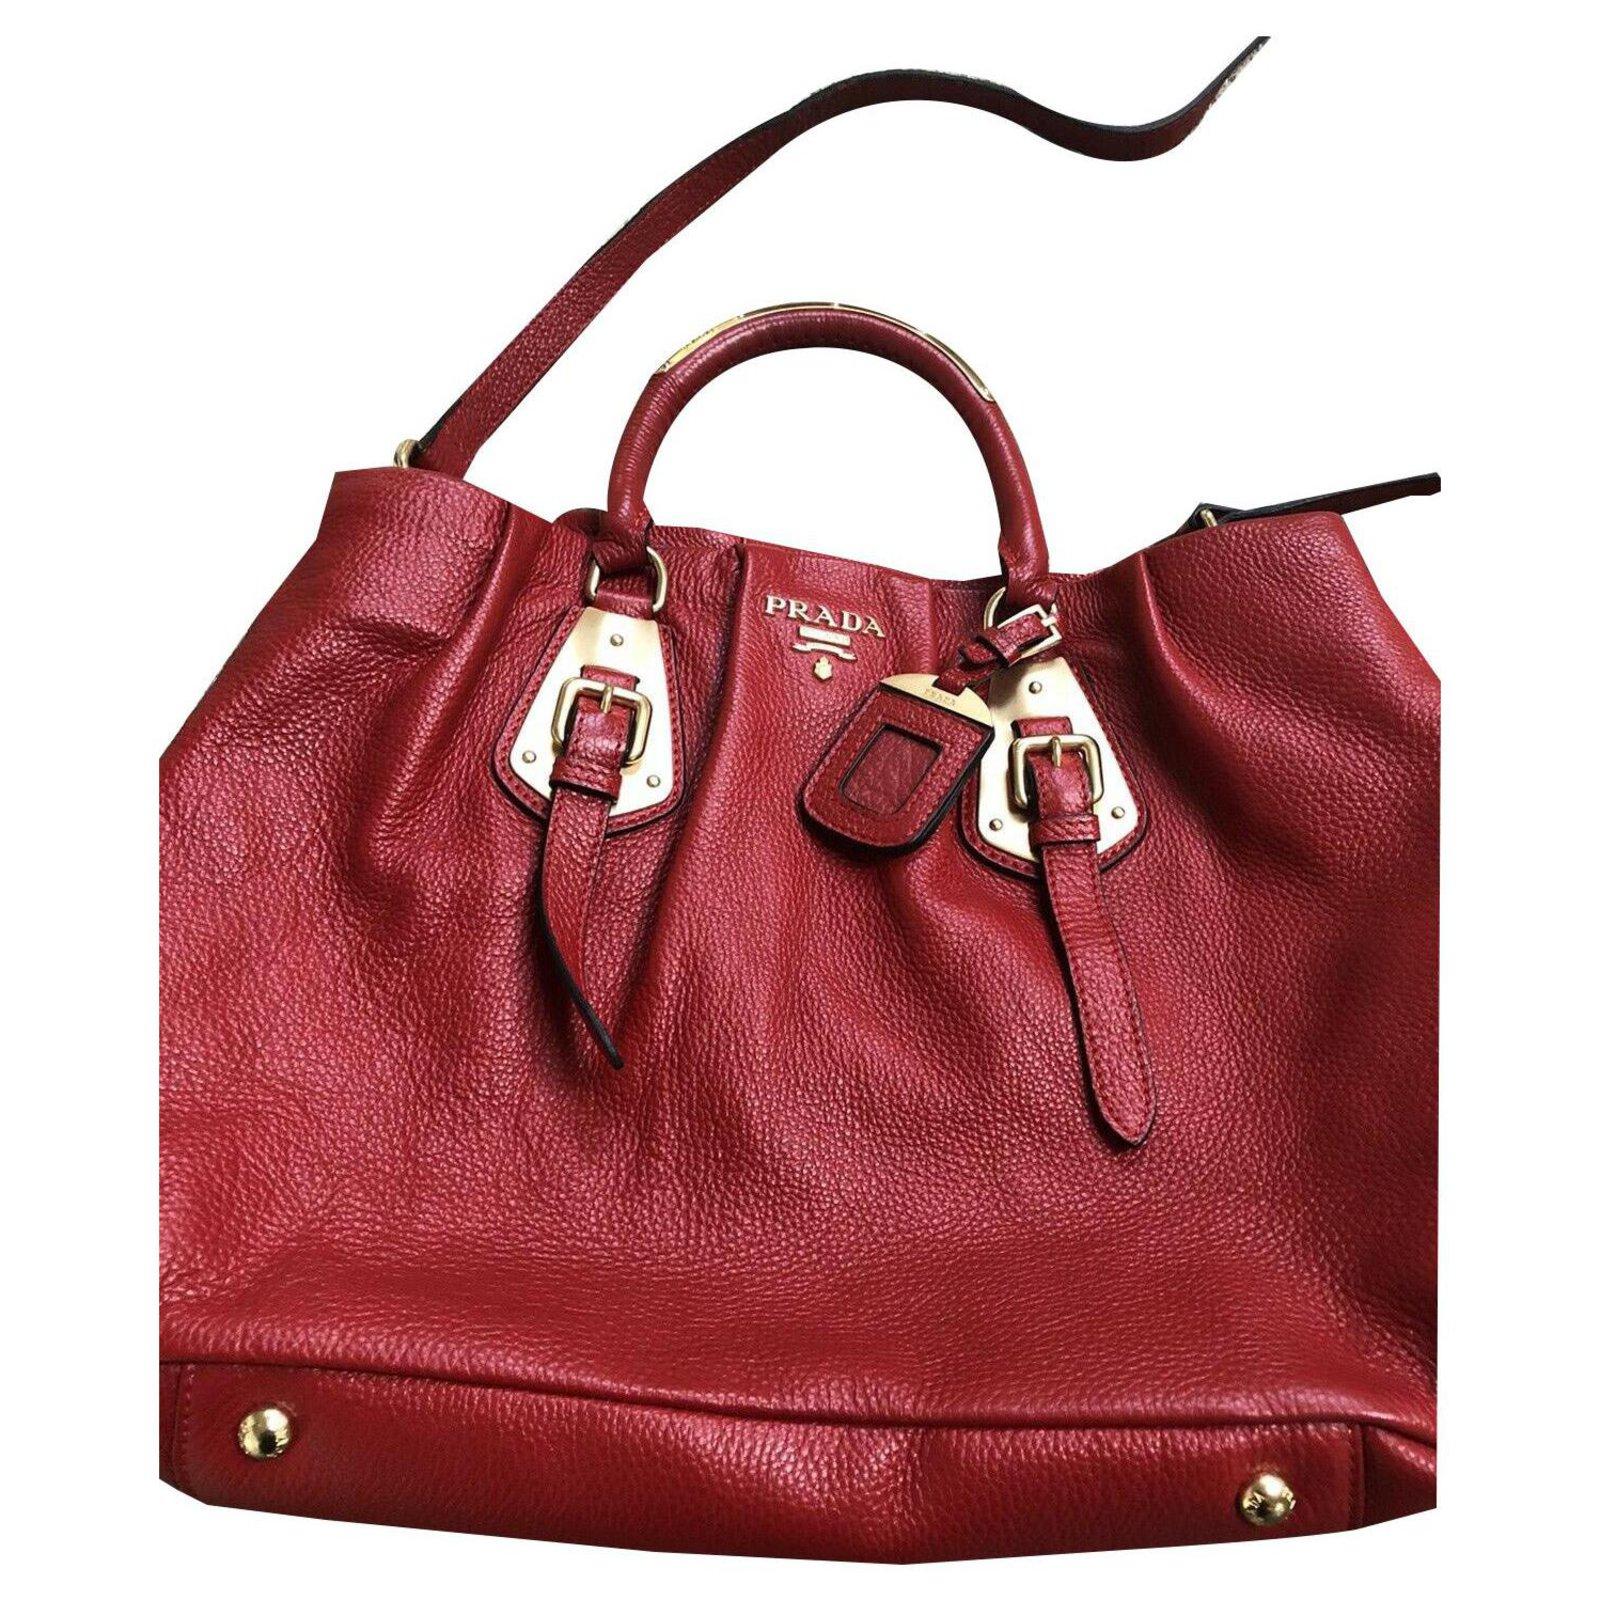 Prada Bag Handbags Leather Red